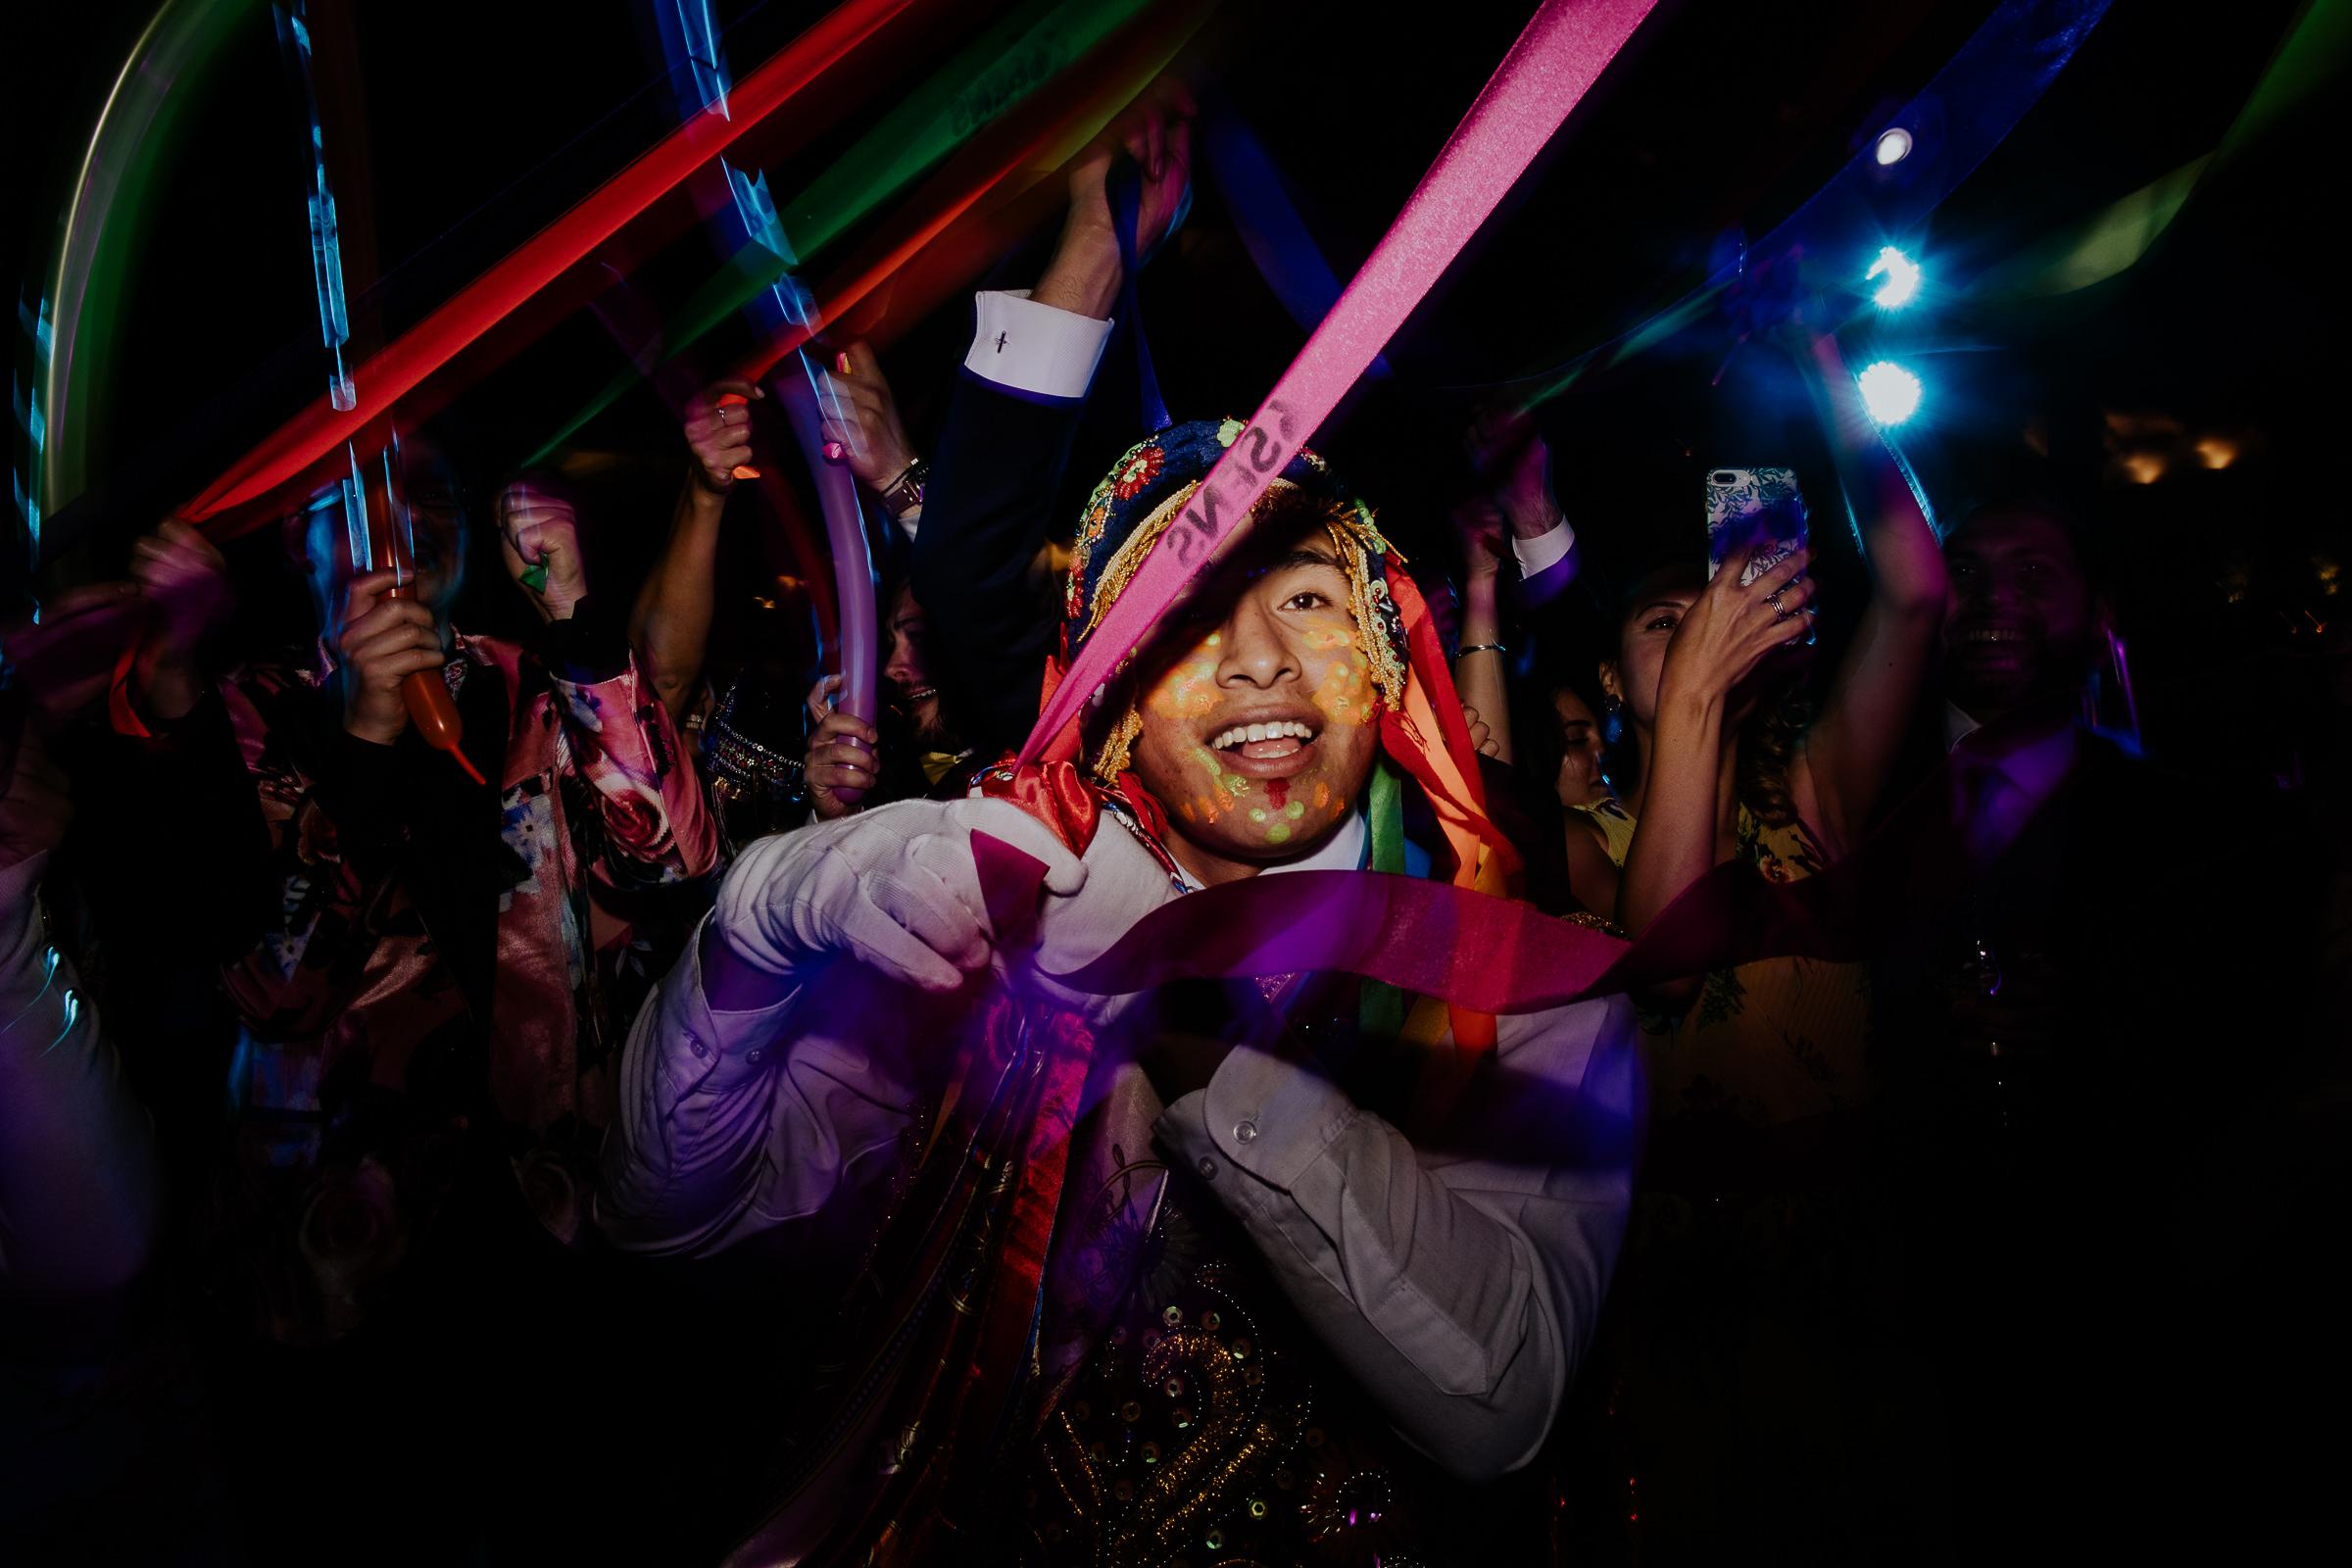 wedding party in peru